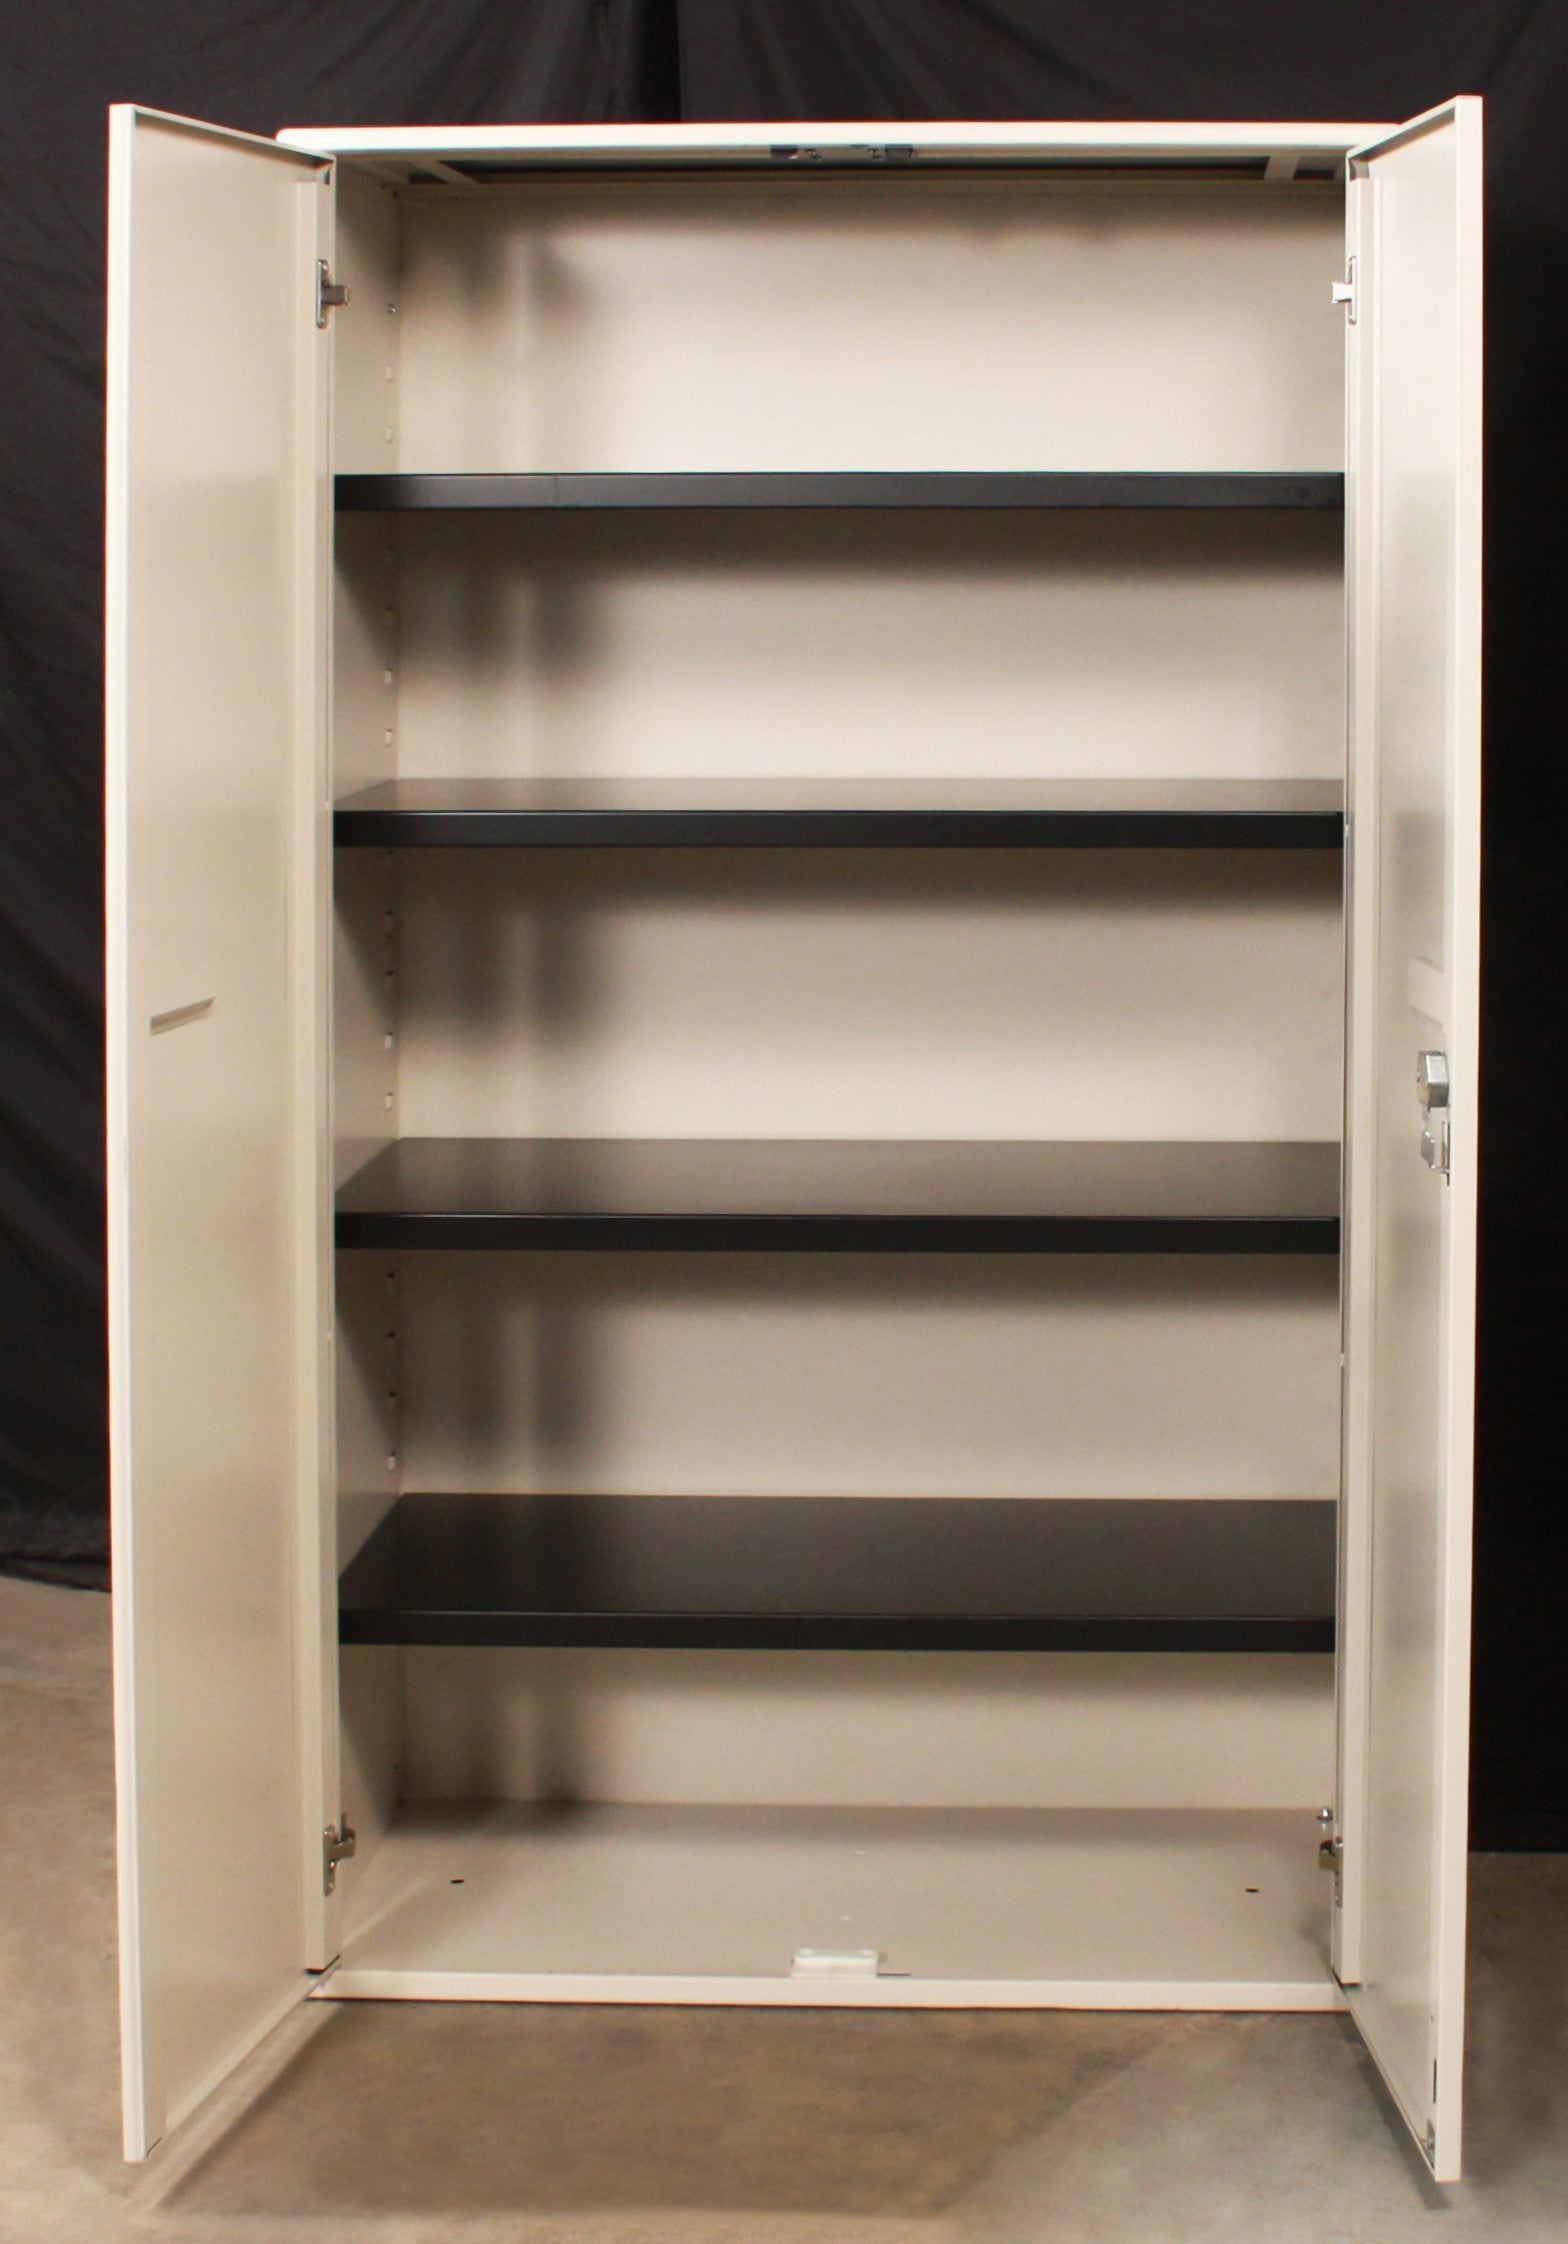 Haworth Used Putty 5 Shelf 63 Inch Tall Storage Cabinet